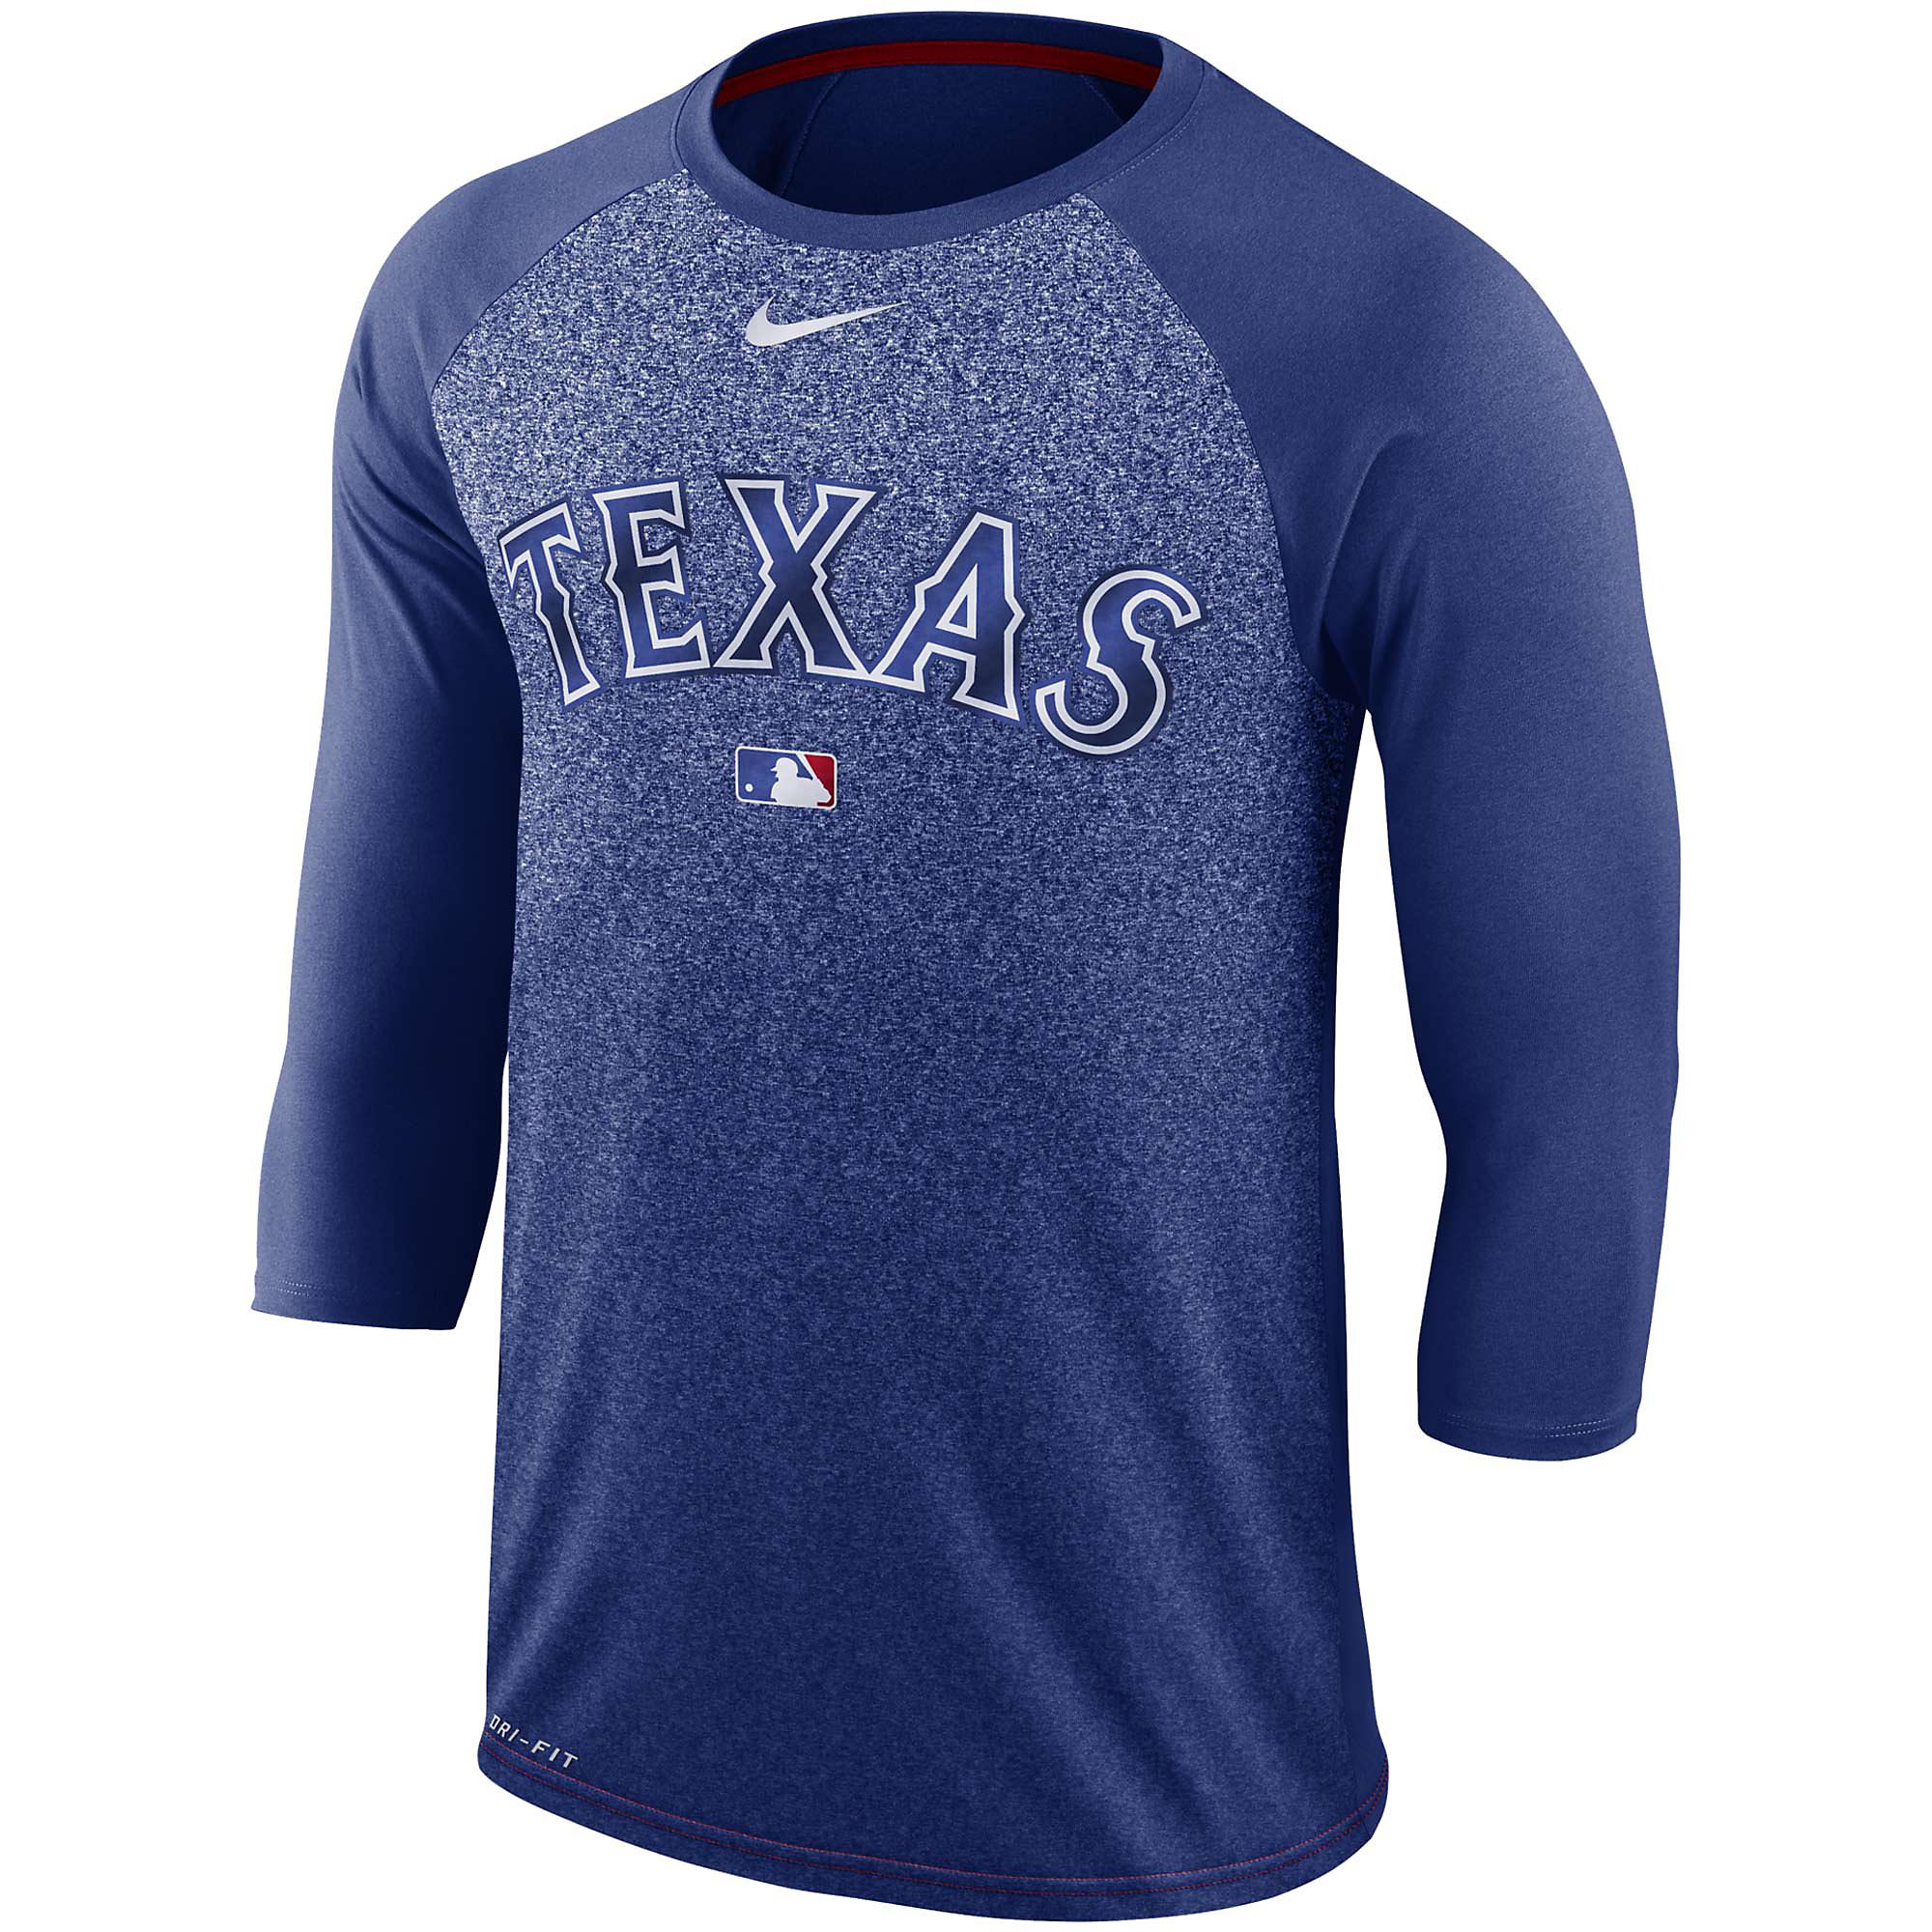 Texas Rangers Nike Legend 3/4 Raglan Tee